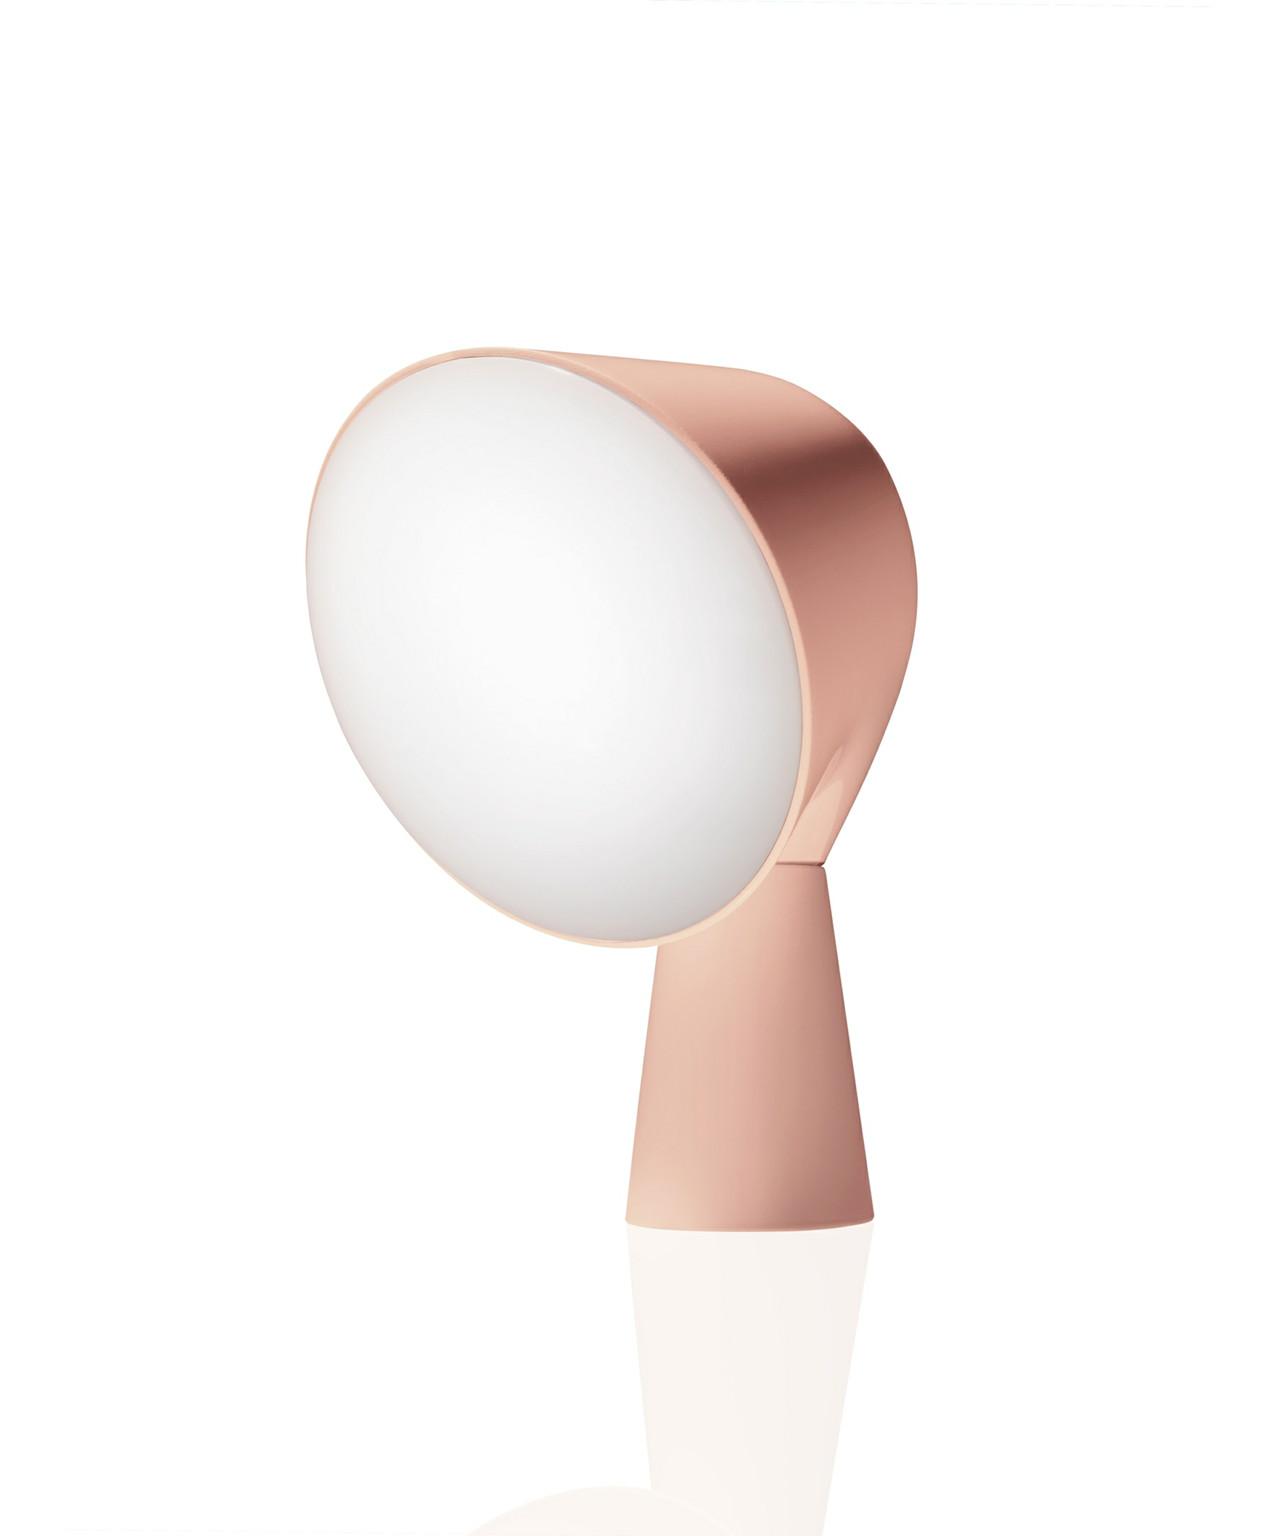 Image of   Binic Bordlampe Rosa - Foscarini